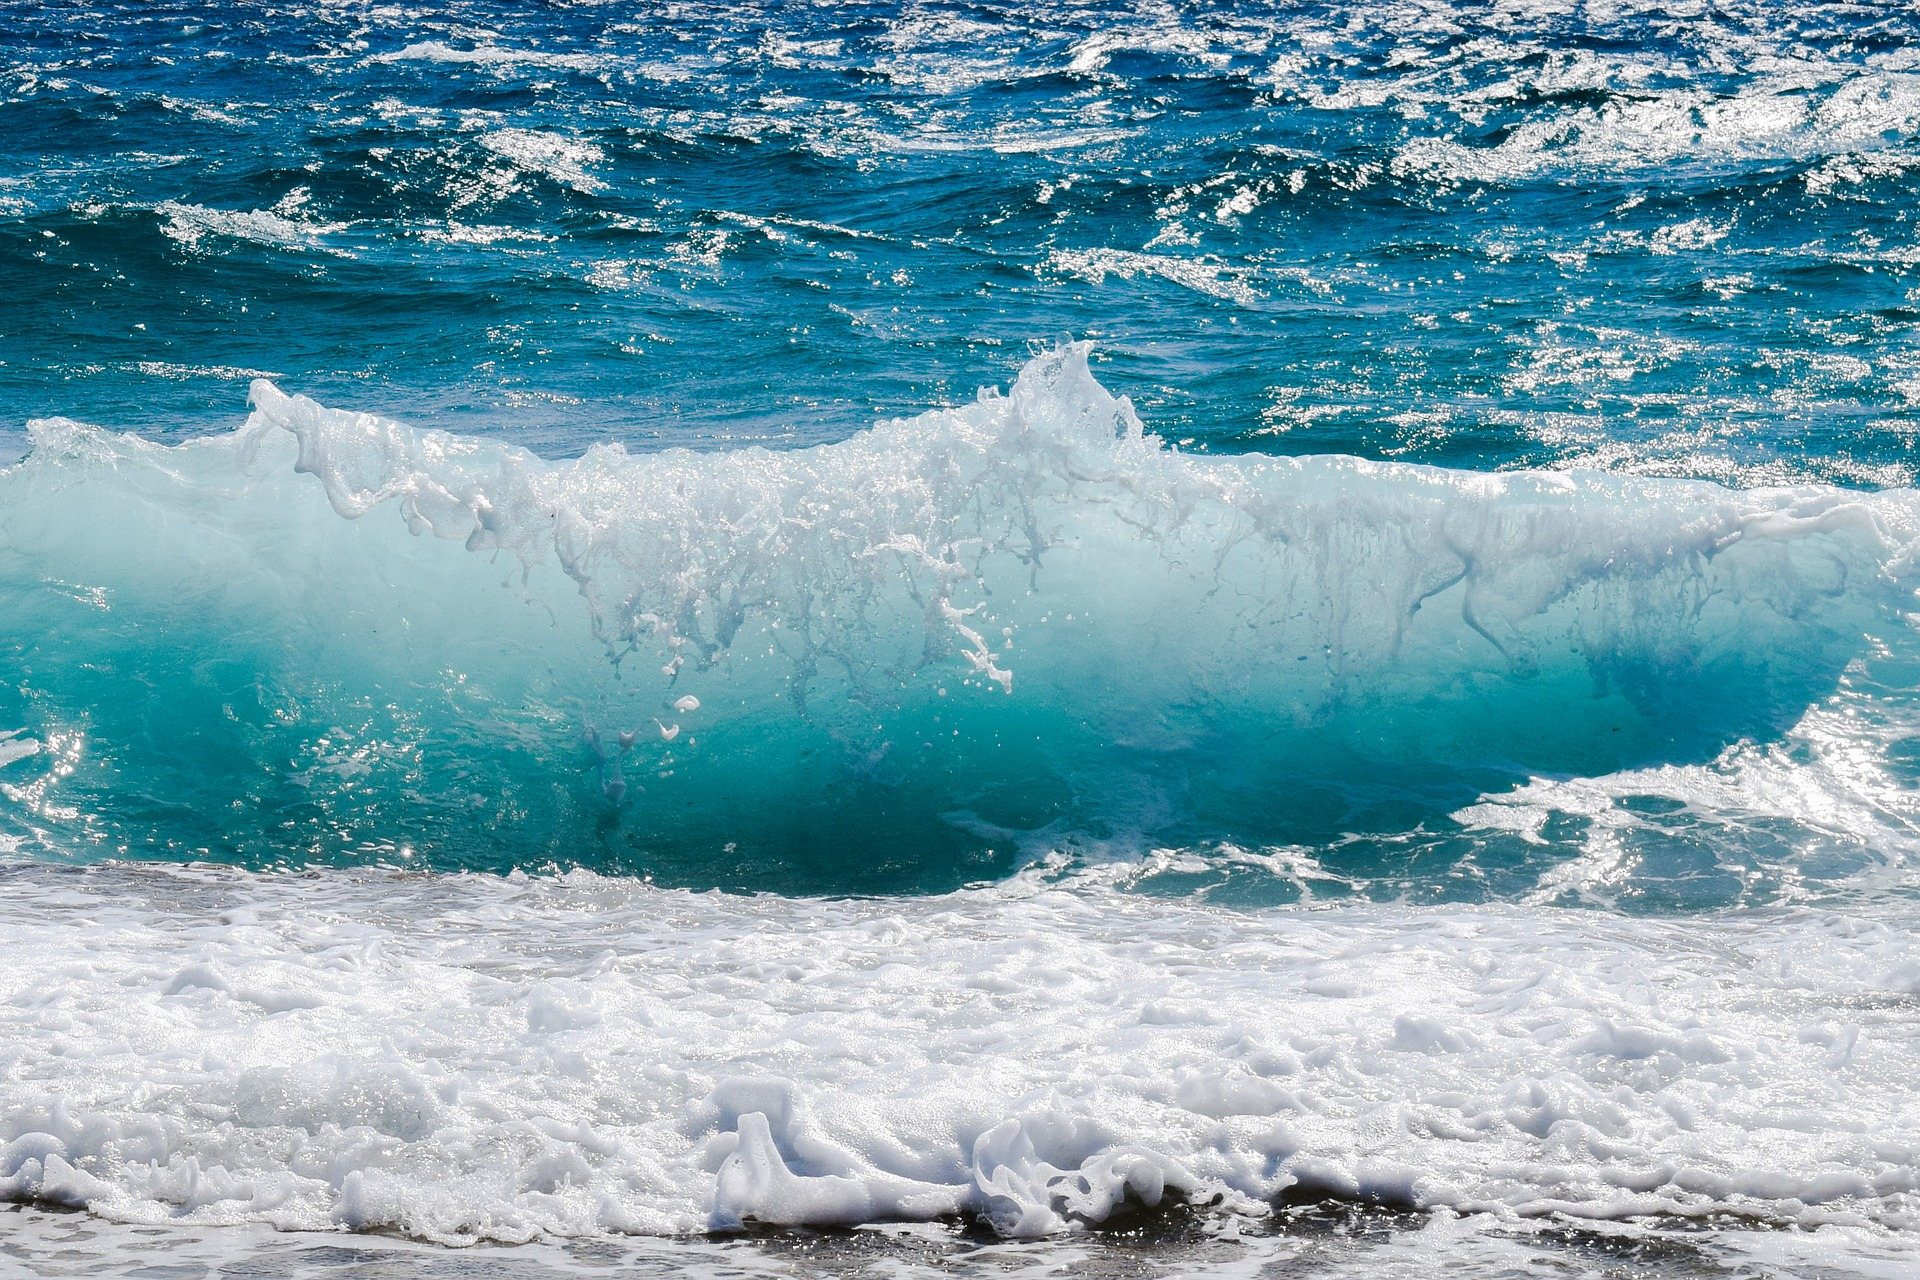 wave-2211925_1920.jpg